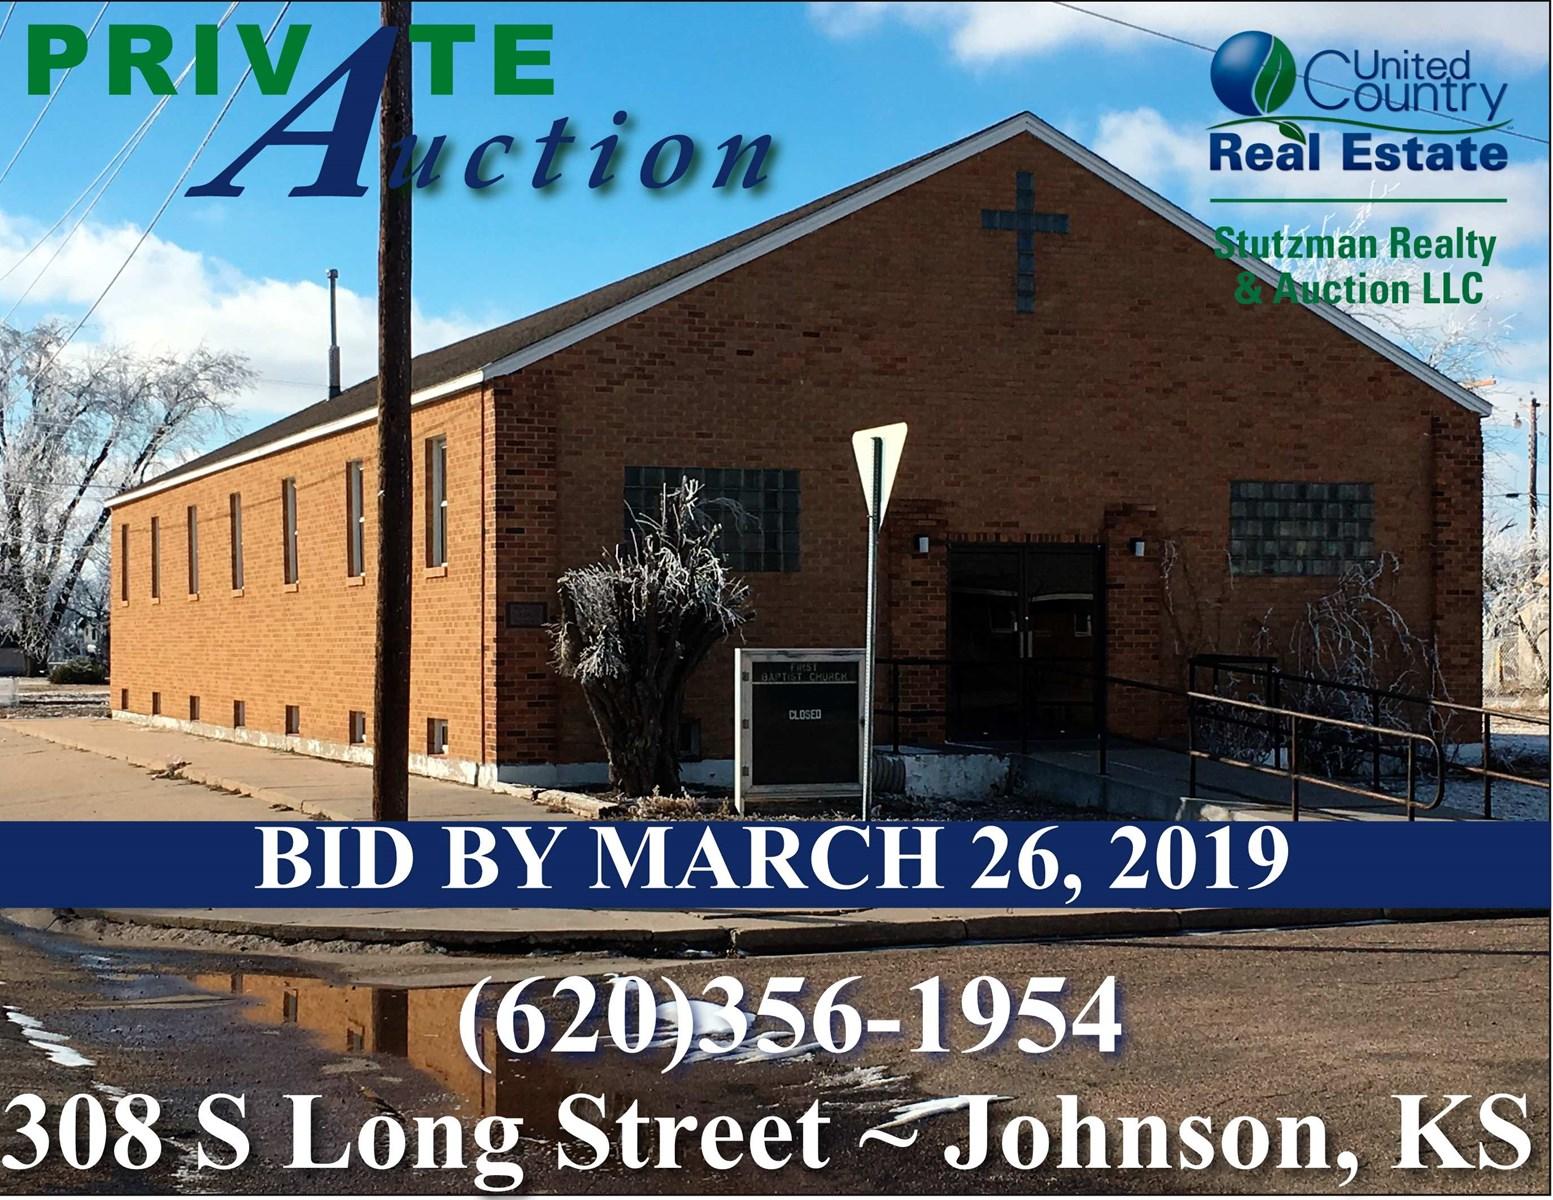 PRIVATE AUCTION - 308 S LONG, JOHNSON, KANSAS